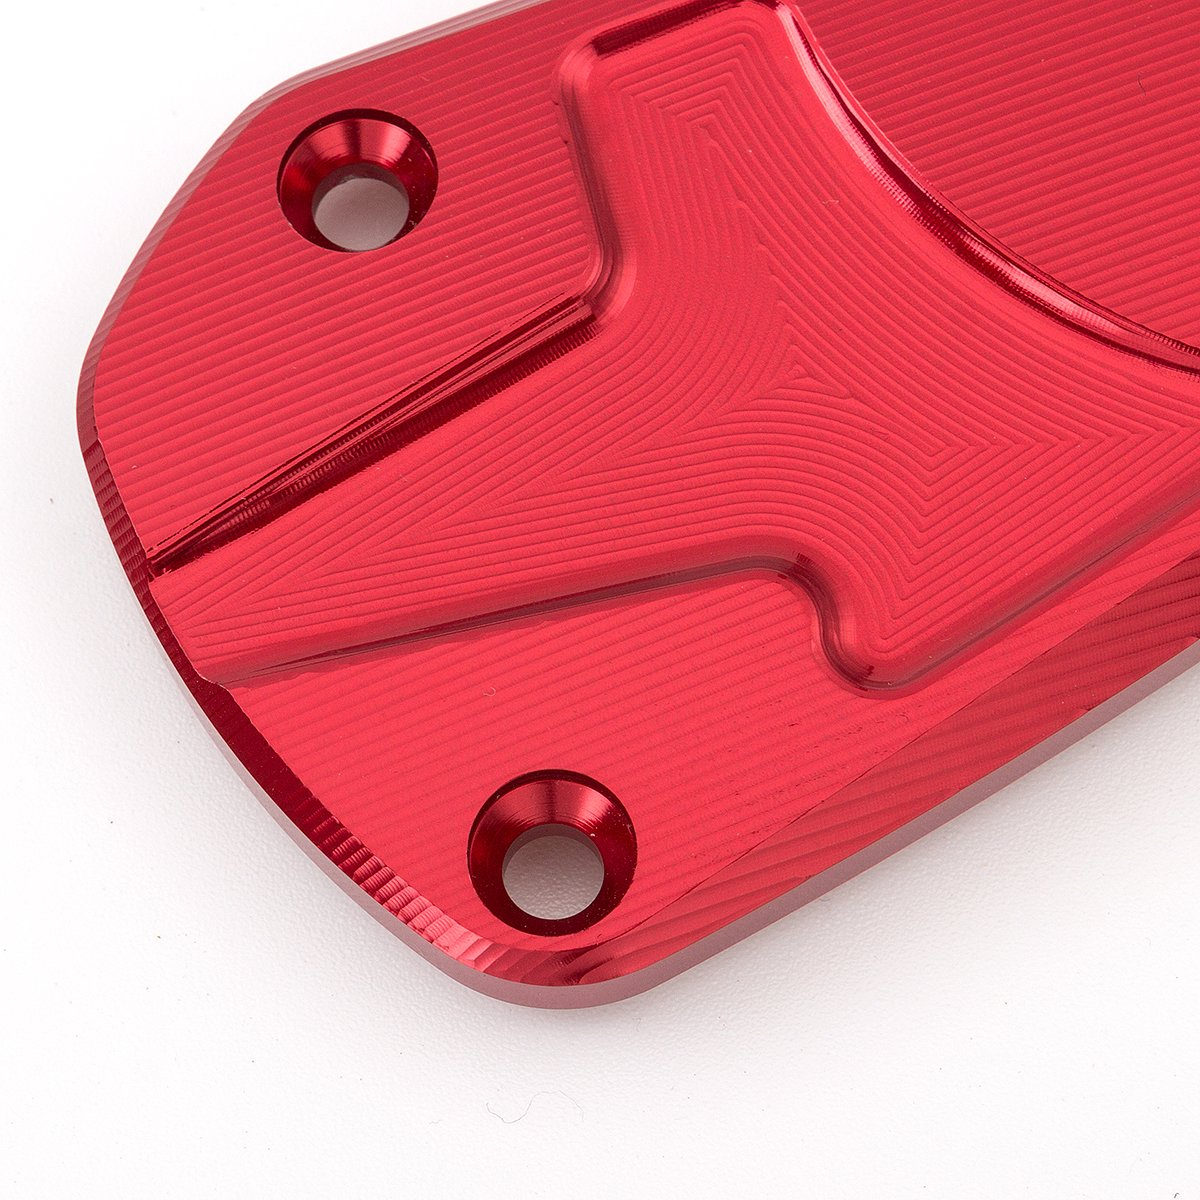 FXCNC Racing Motorcycle Master Cylinder Front Brake Clutch Fuel Reservoir Cover Tank Cap Fit For Aprilia SHIVER//GT 07-16,DORSODURO 750 08-16 Moto Guzzi MGX21 16-17,CALIFORNIA Custom 14-17